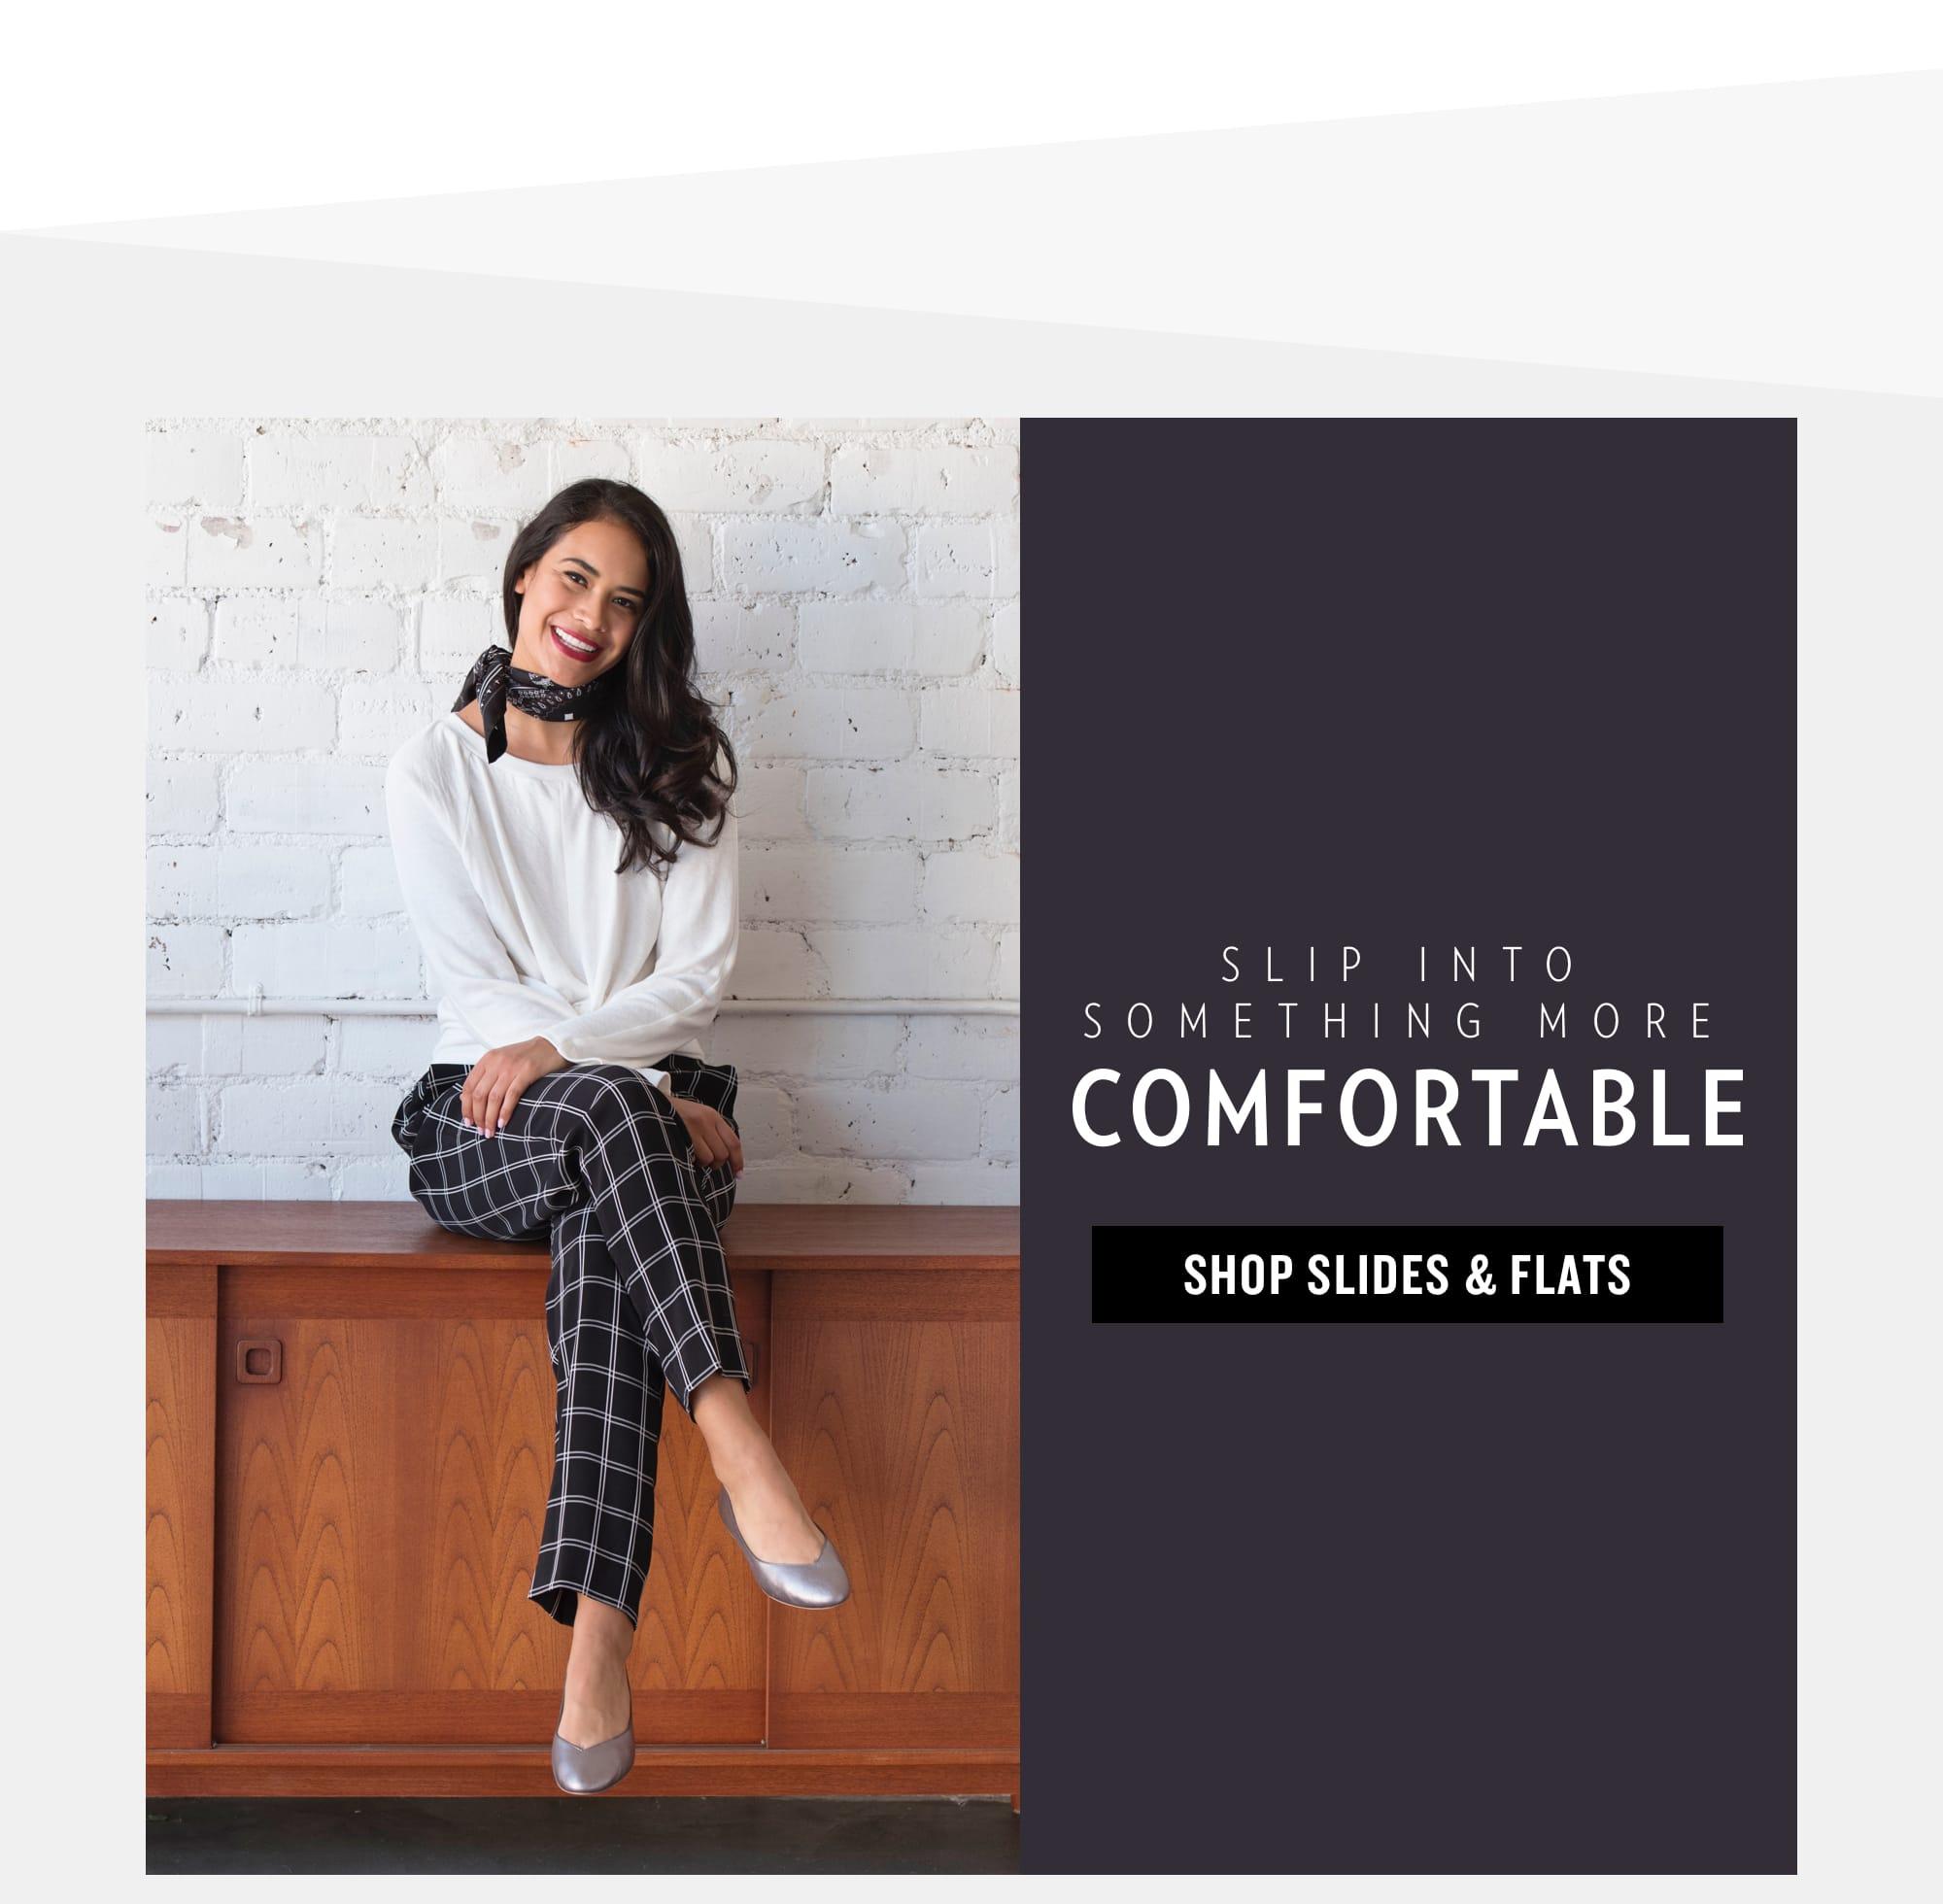 Comfort Slides And Flats